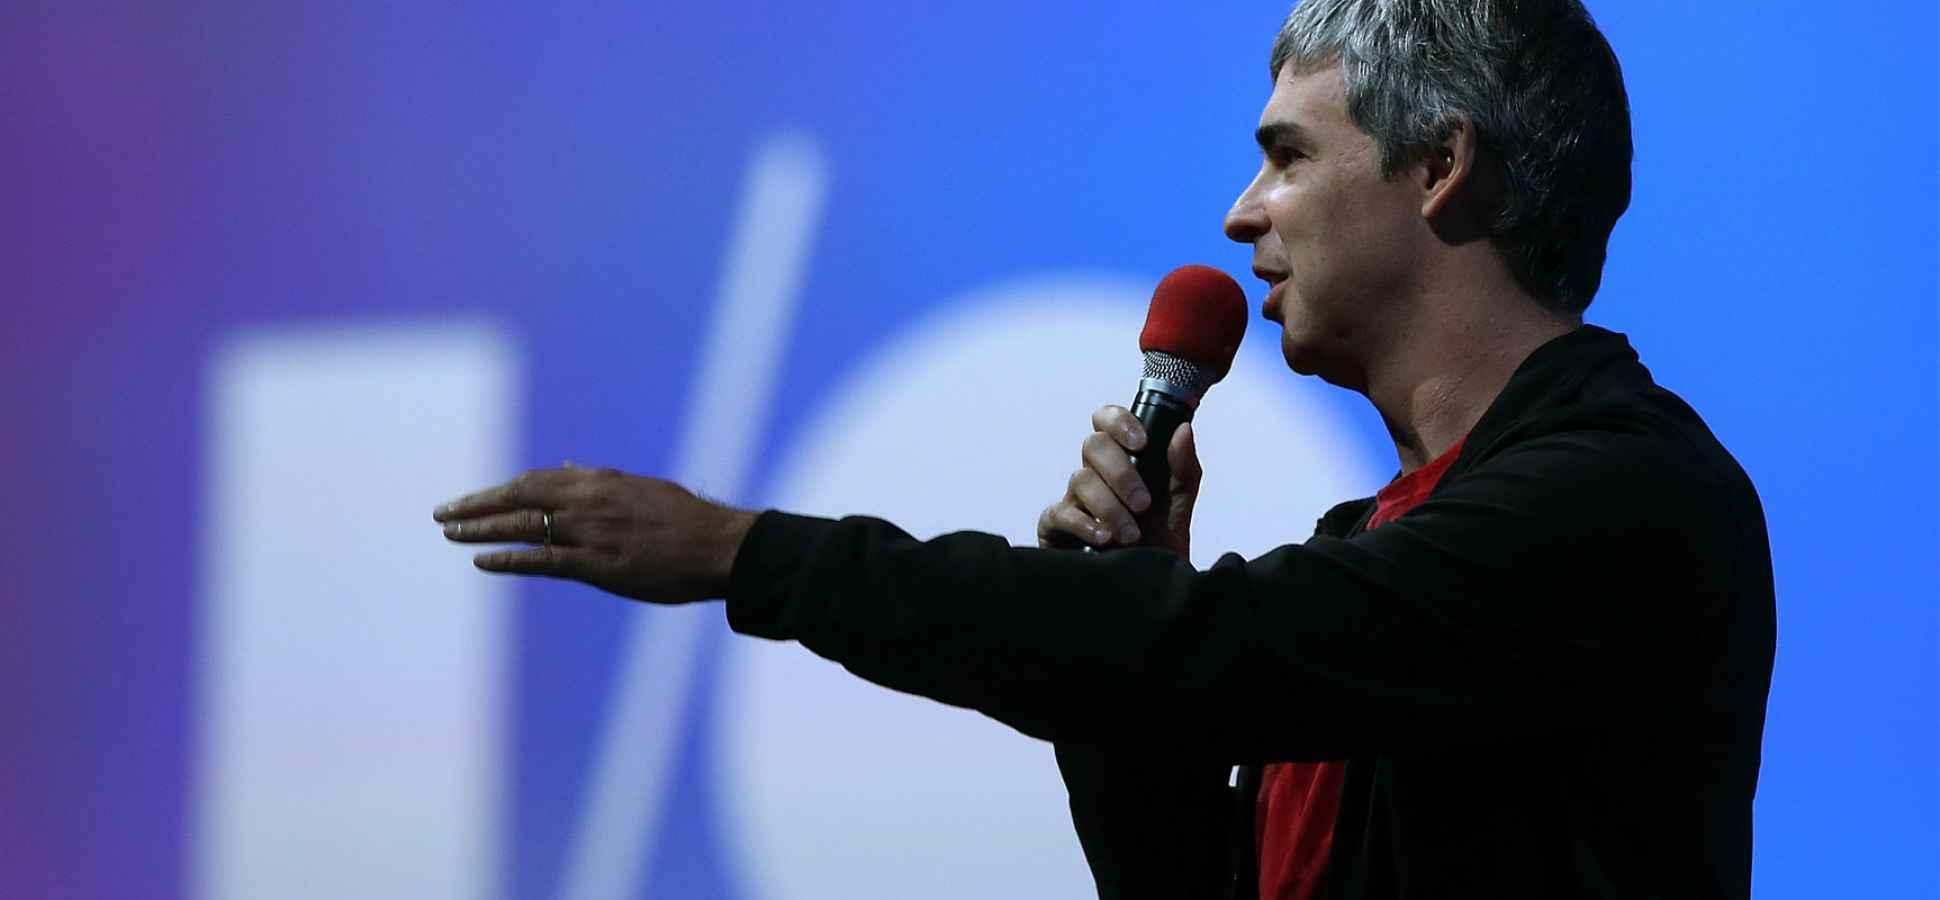 5 Takeaways From Google I/O 2013